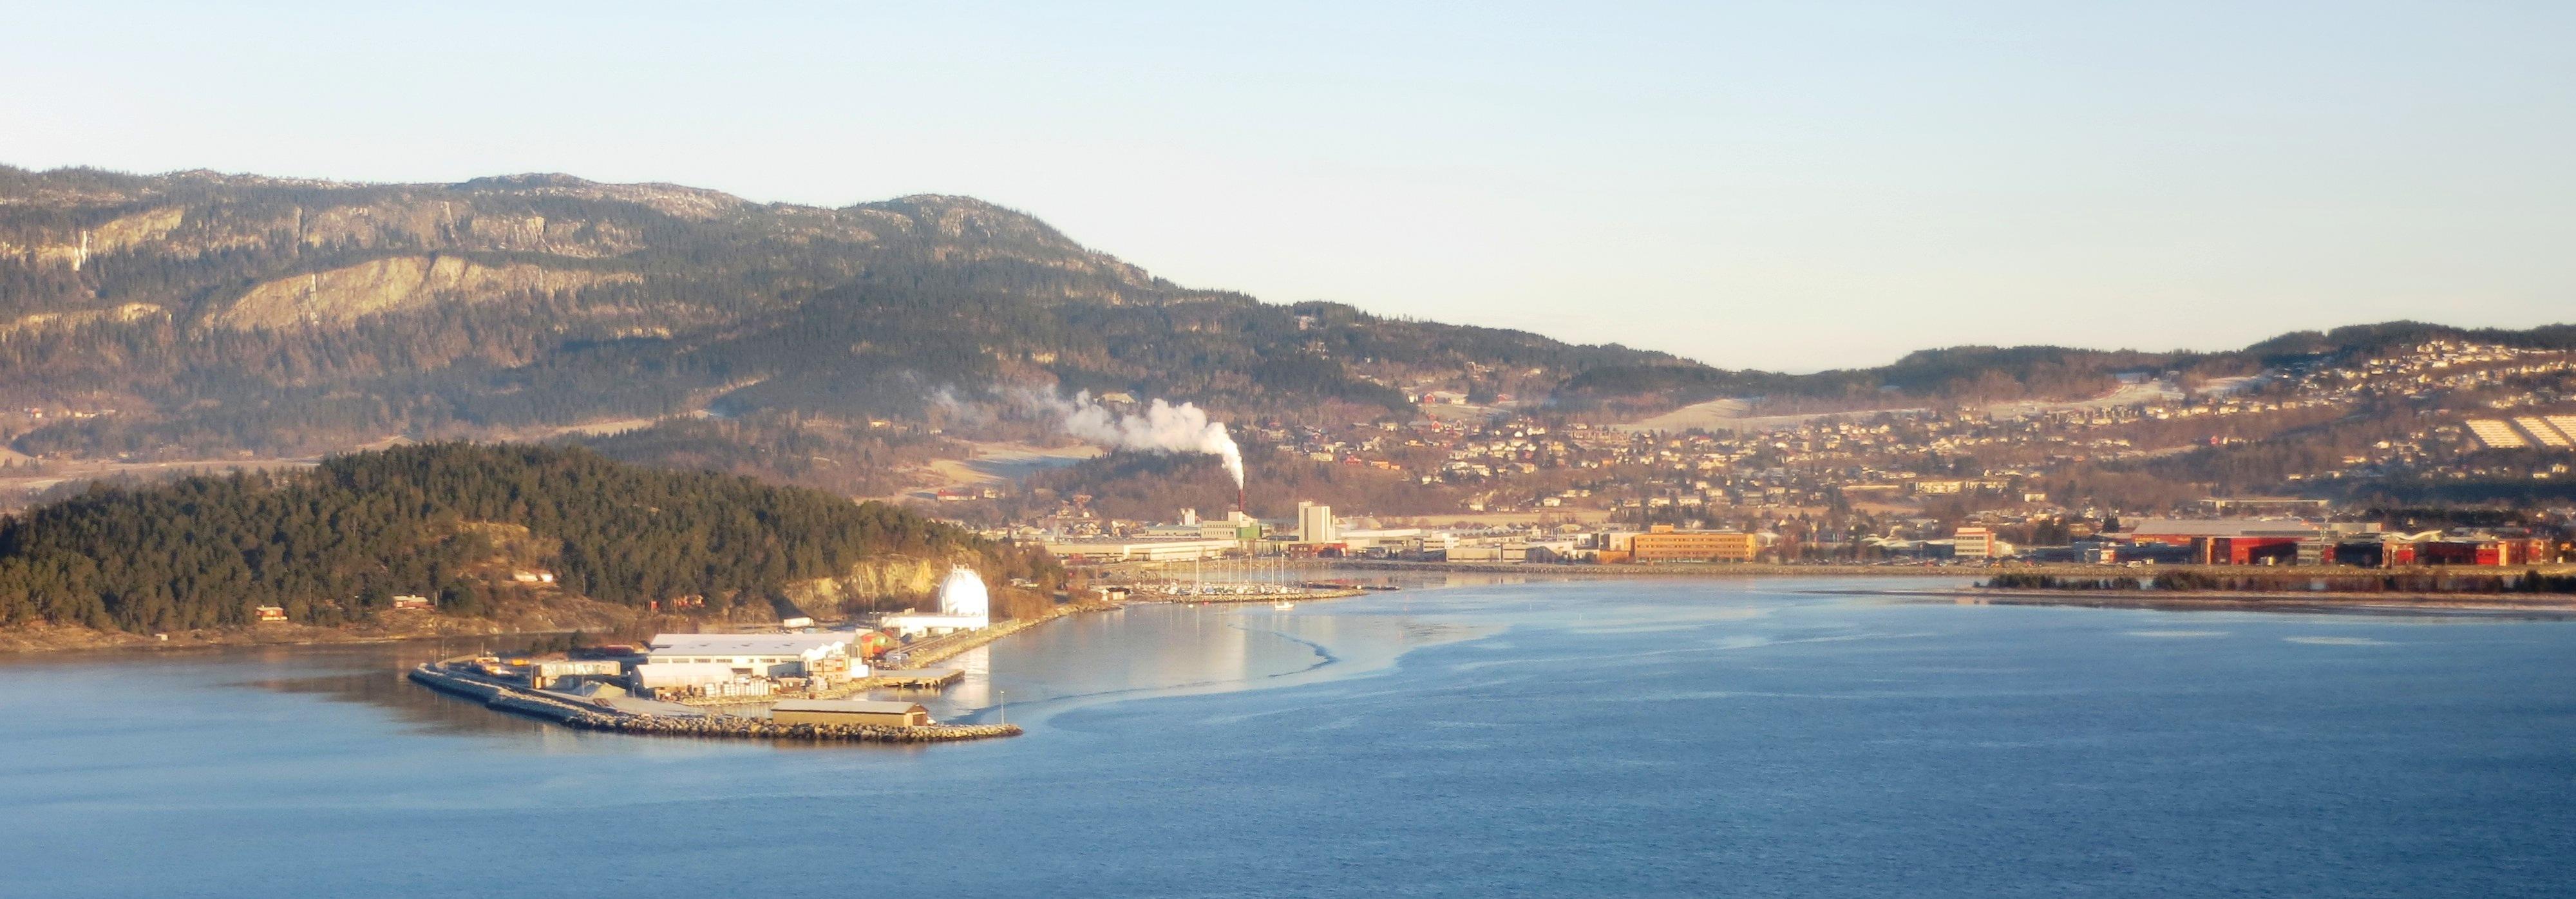 Stjordal Norway  city photos gallery : Stjordal IMG 4587 Wikimedia Commons